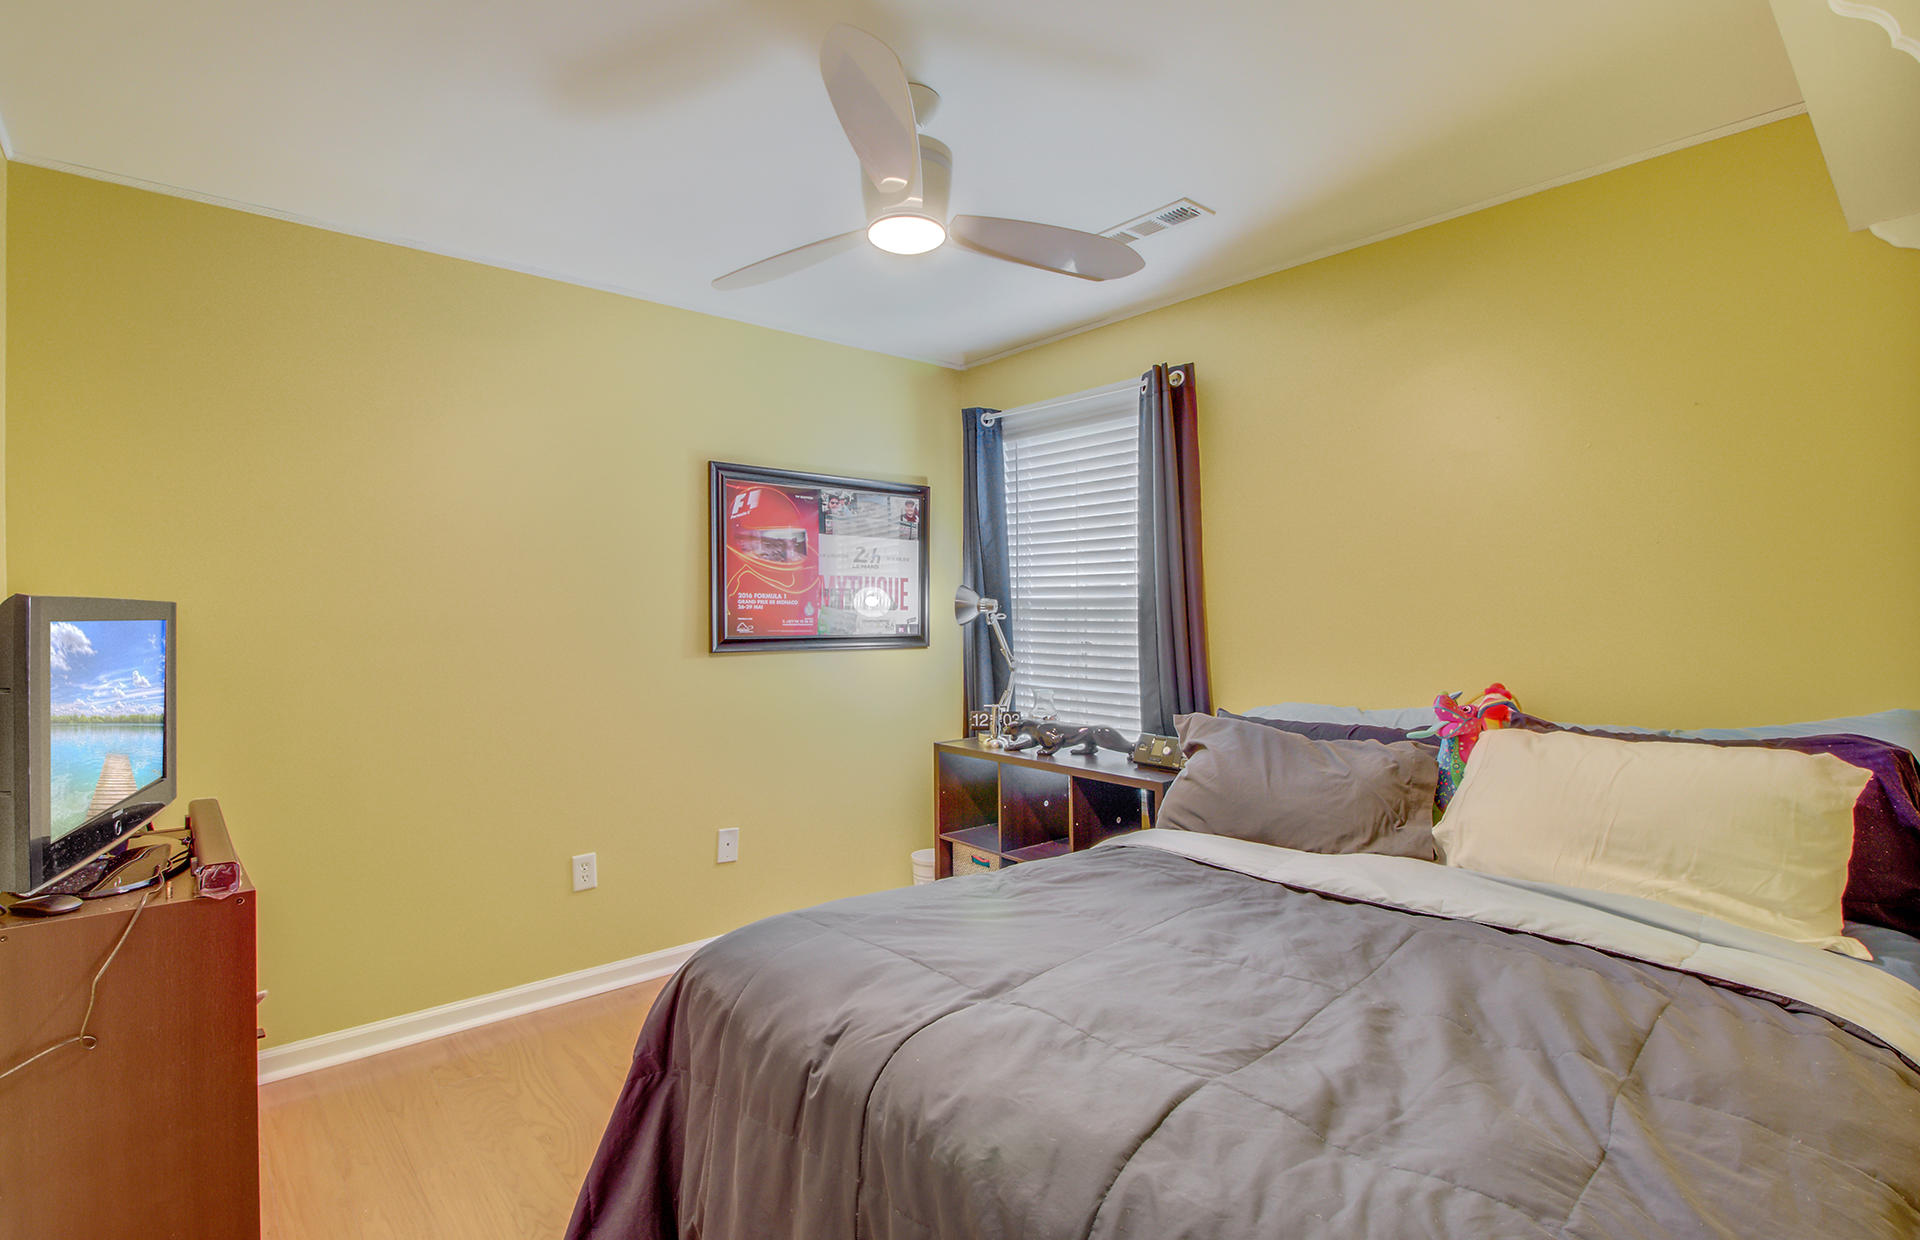 Park West Homes For Sale - 1500 Wellesley, Mount Pleasant, SC - 16